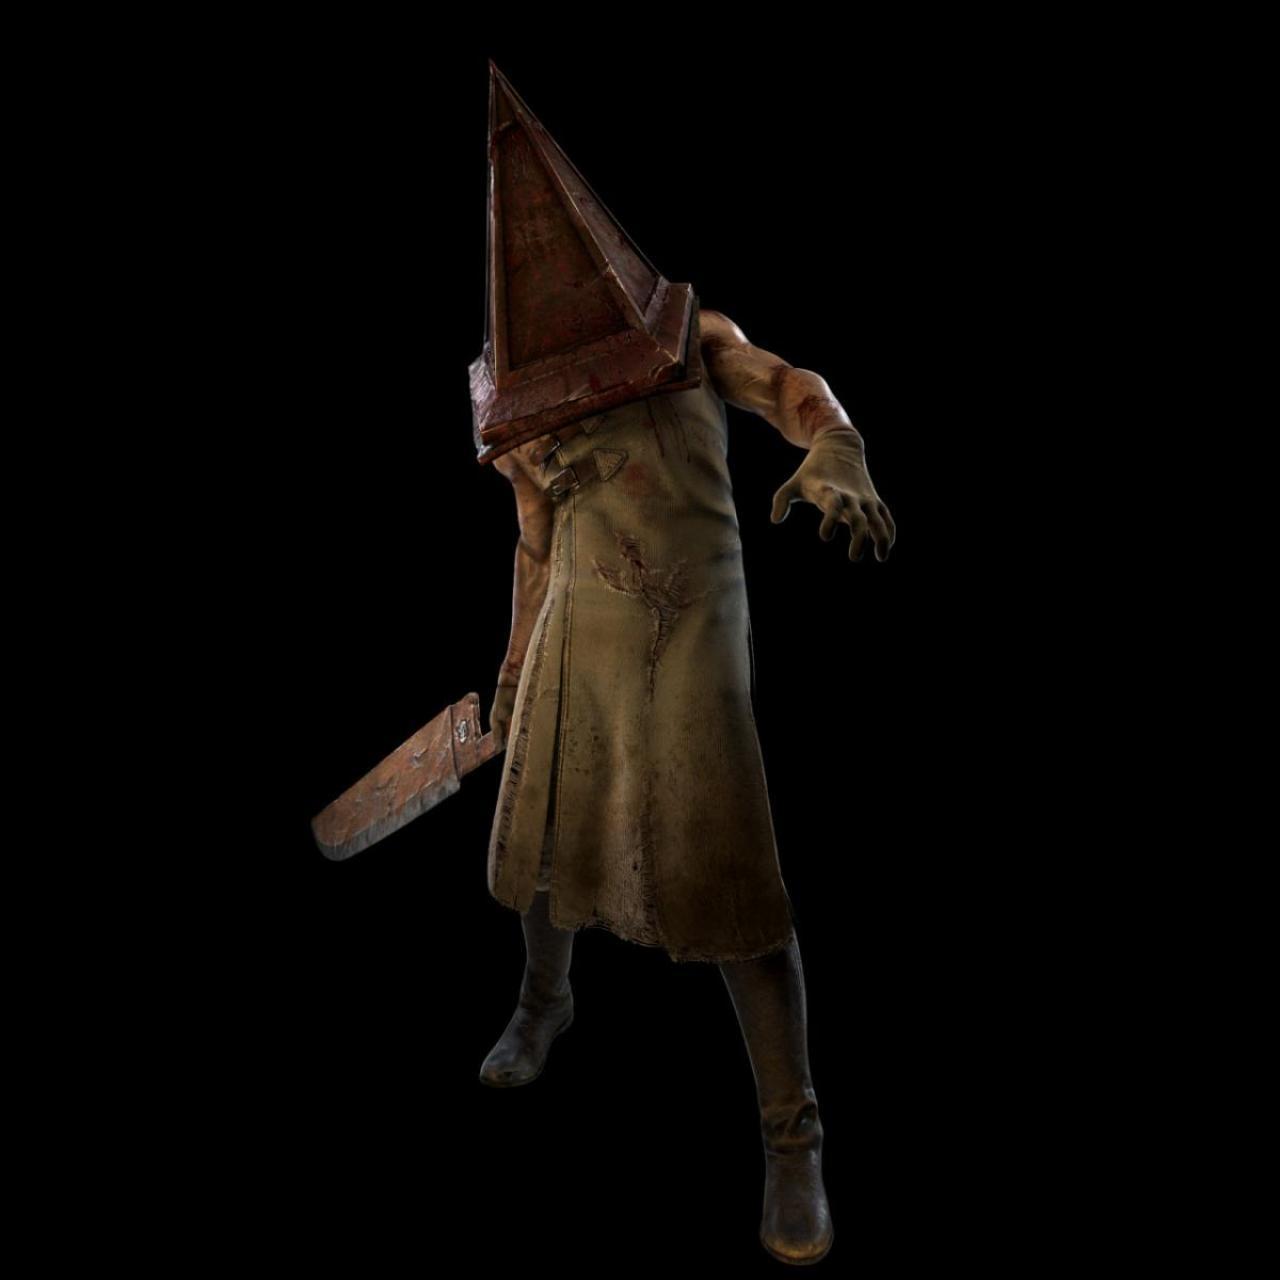 『Dead by Daylight』、次回アップデートは『Silent Hill』と大型コラボ!新マップ / キラー / サバイバー 紹介